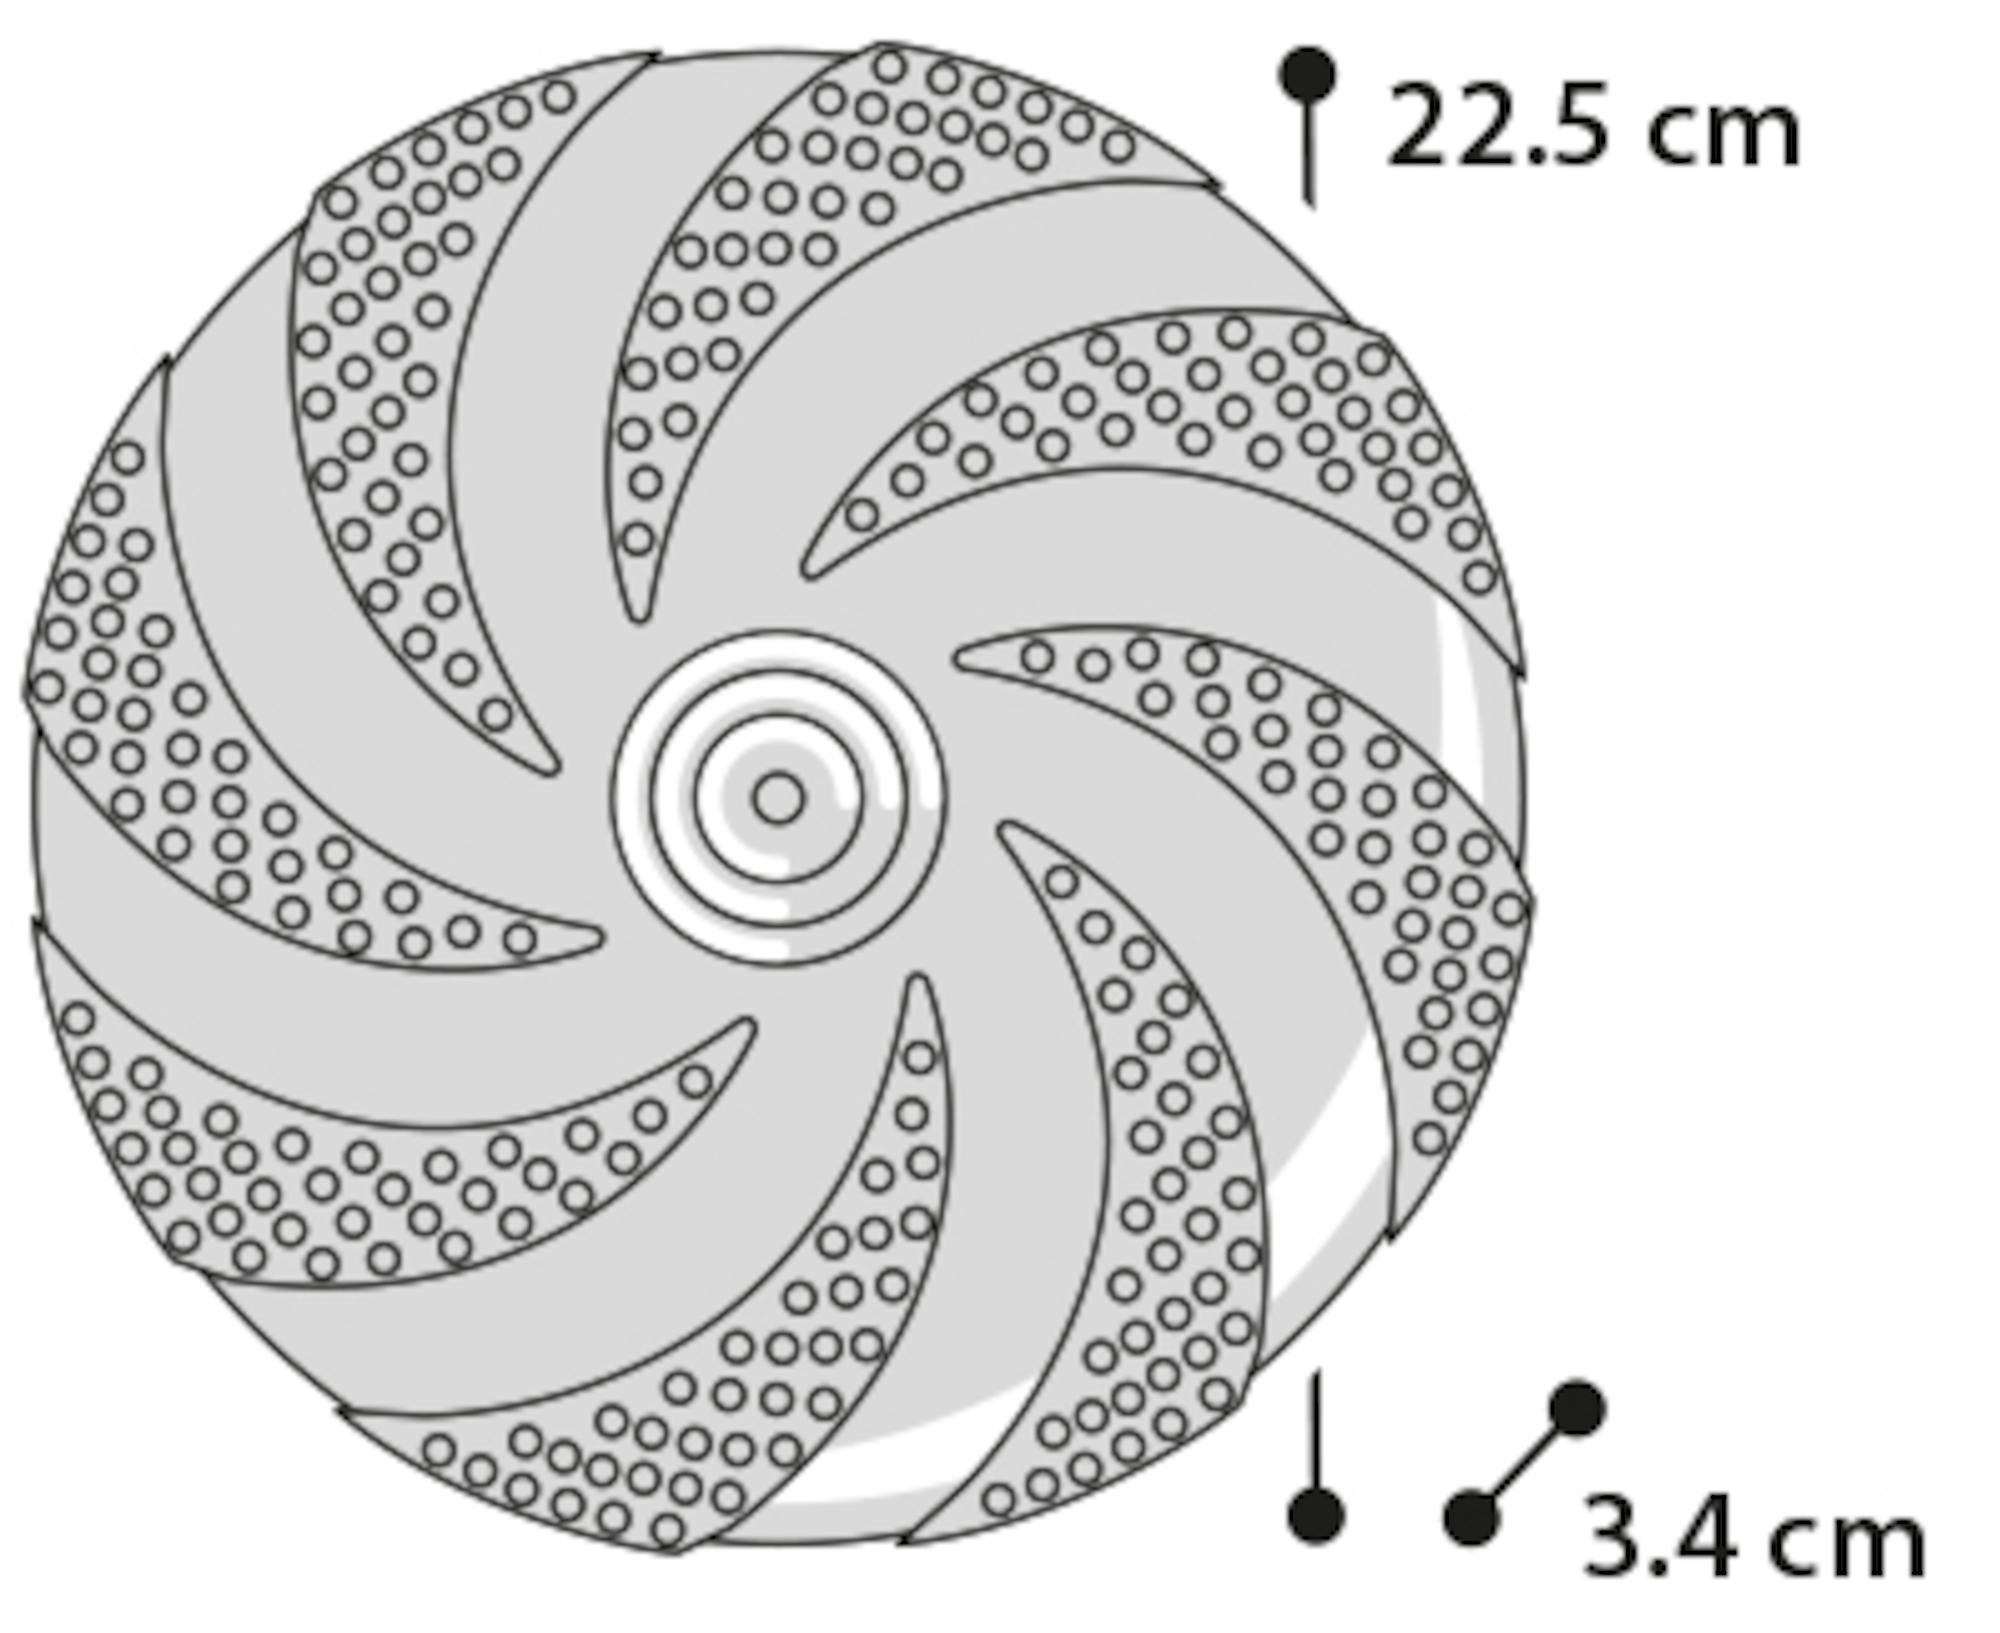 Gummifrisbee - M